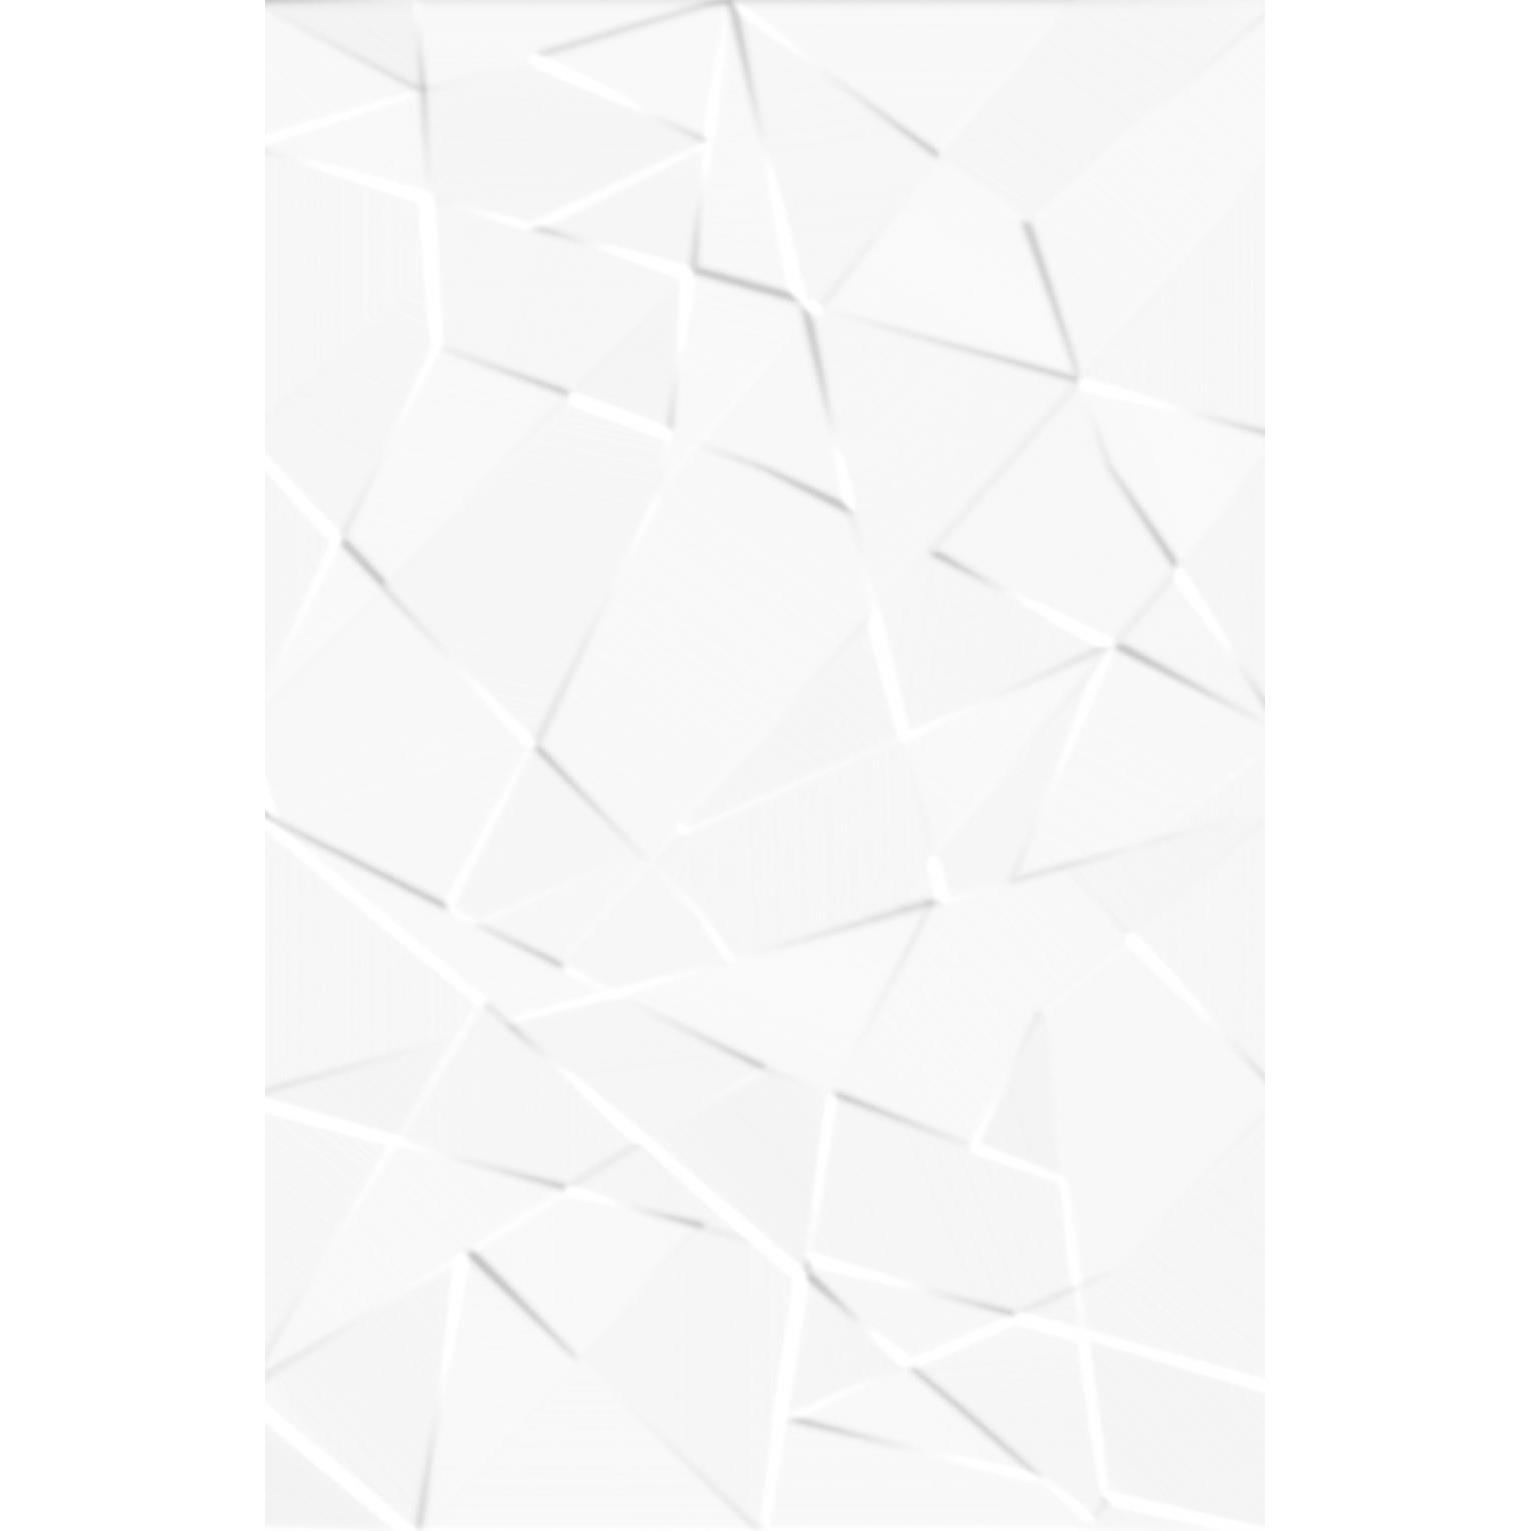 Revestimento RVI66020 Brilhante Tipo A 33x50cm 248m Branco - Incenor